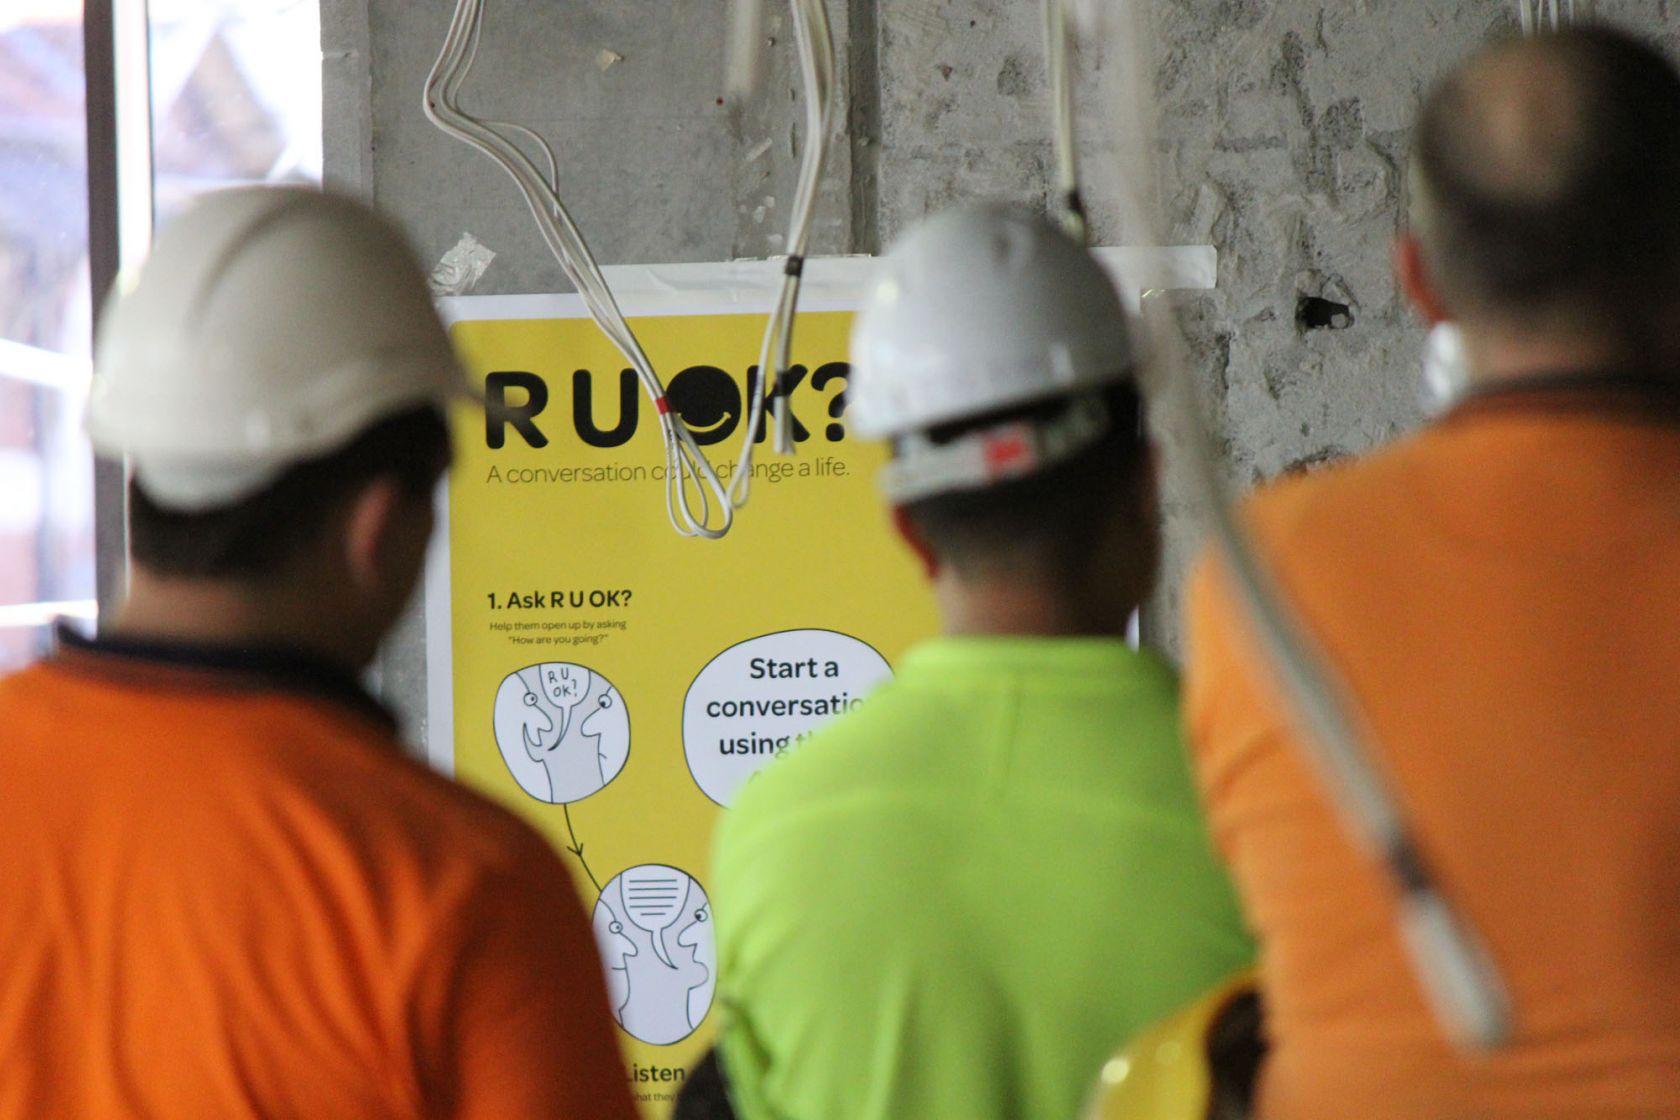 ruok day schiavello construction sydney